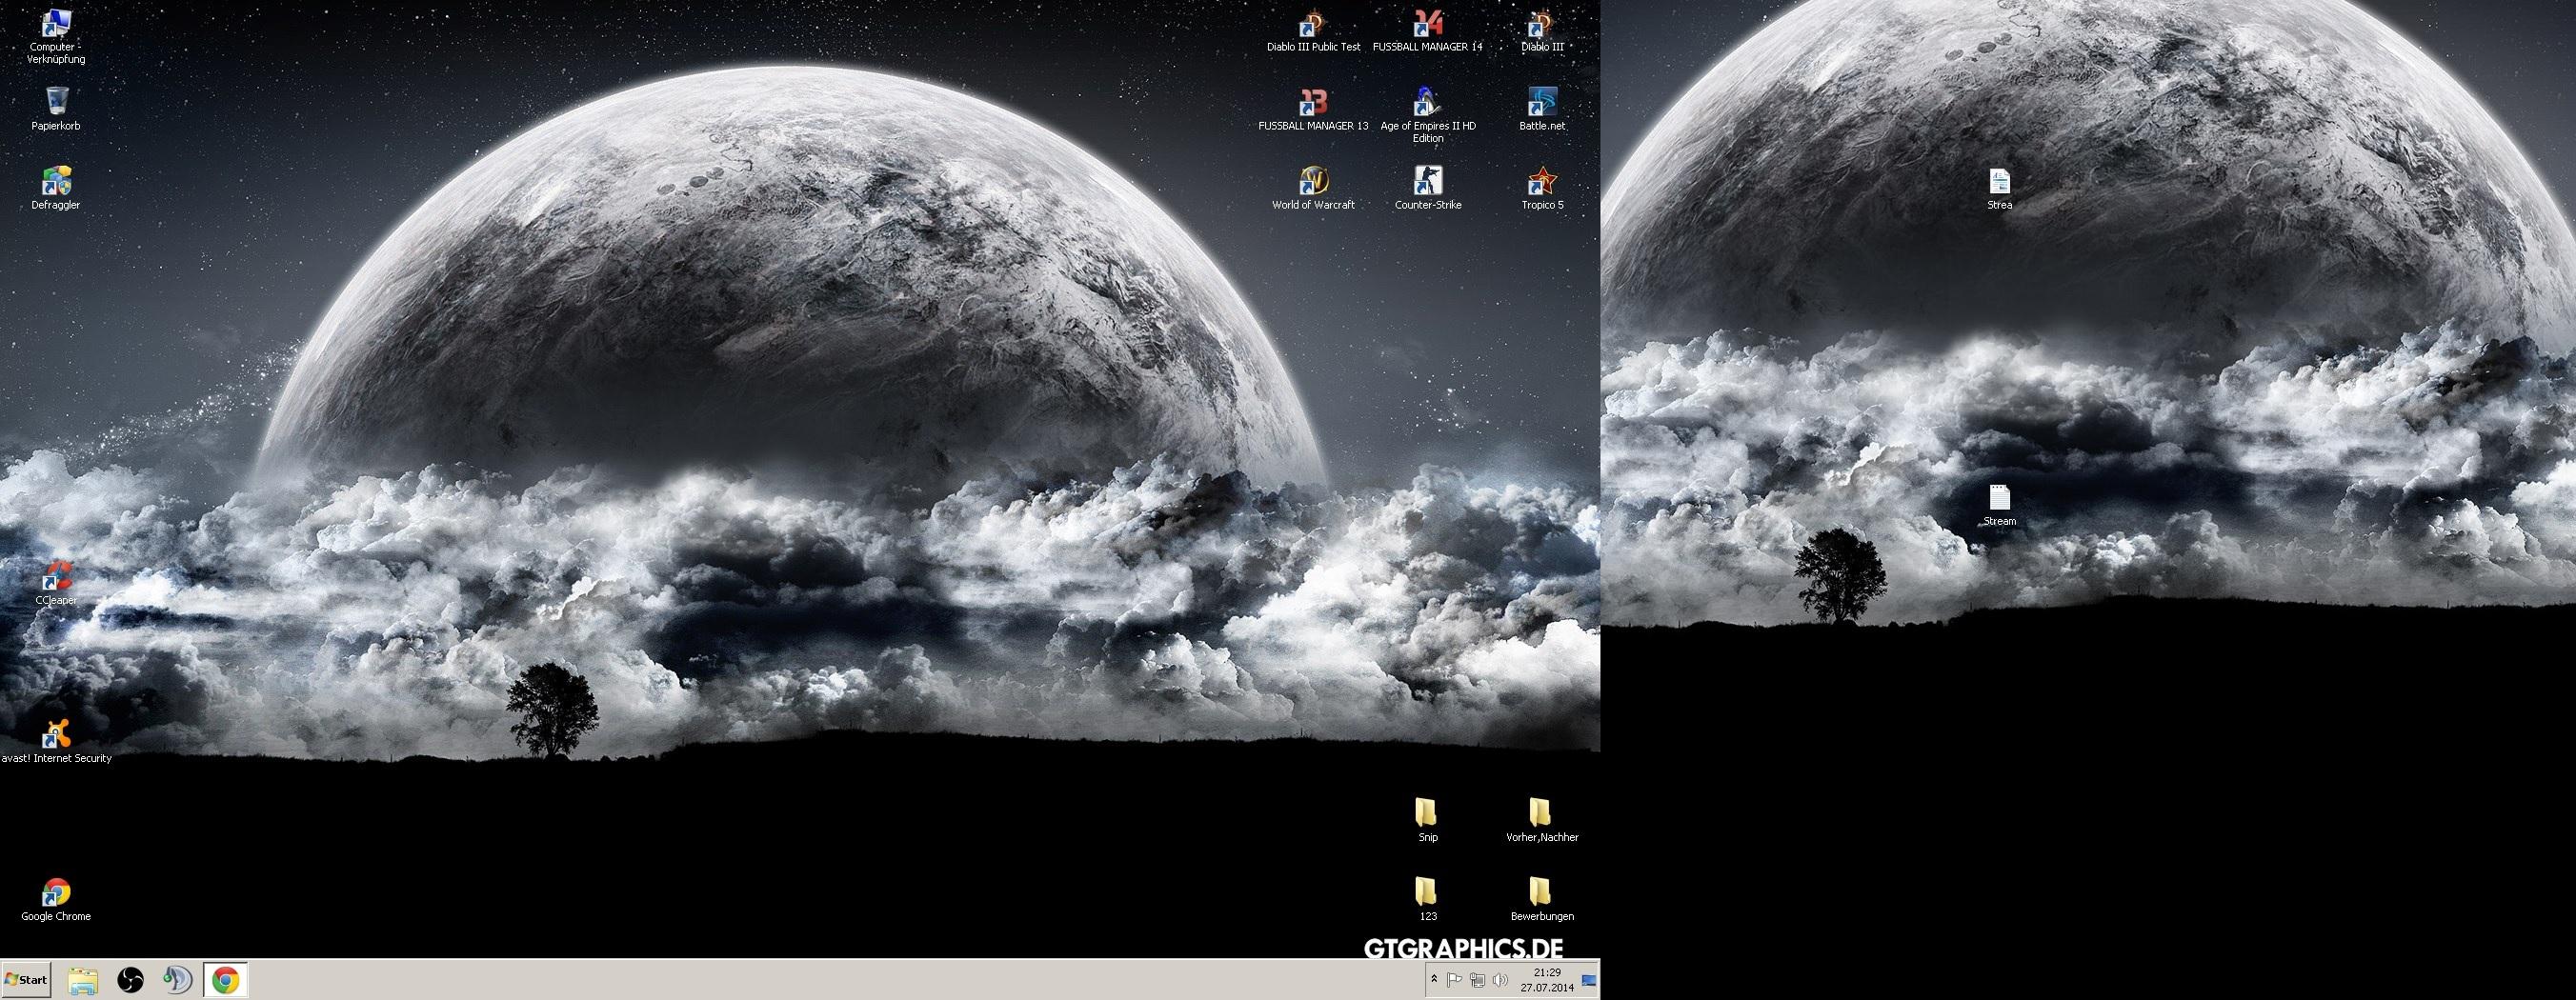 http://abload.de/img/desktopdwc5x.jpg